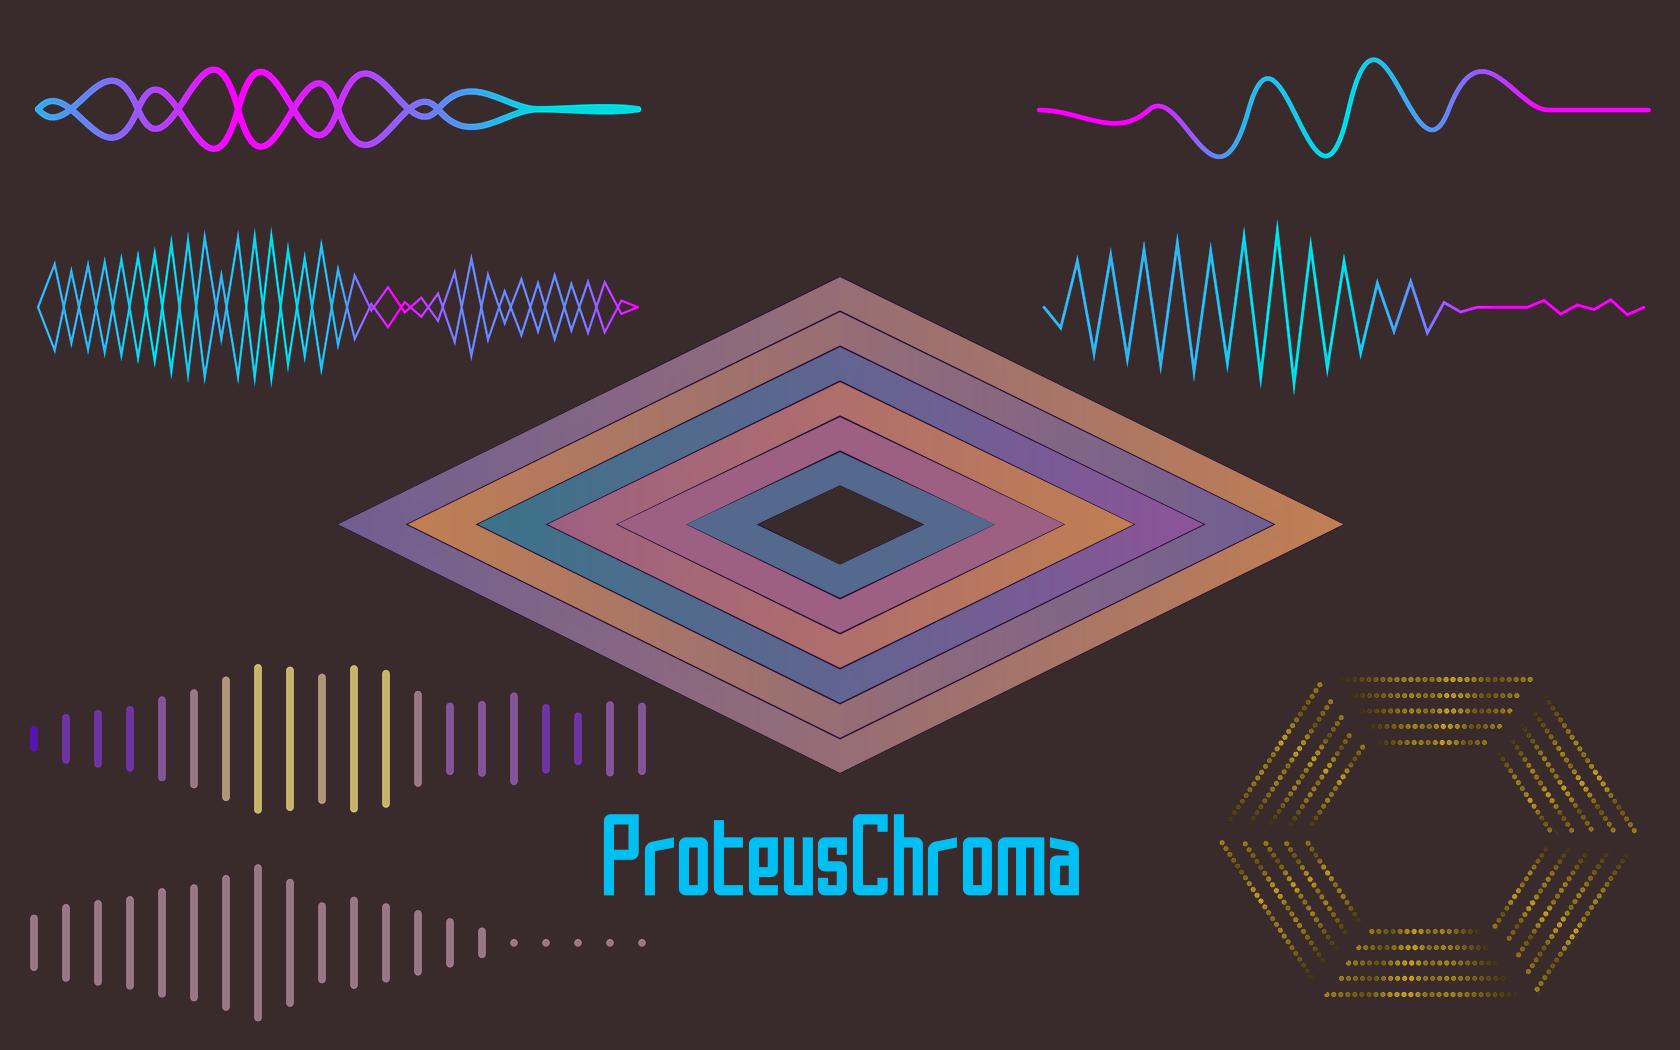 ProteusChroma v1.0